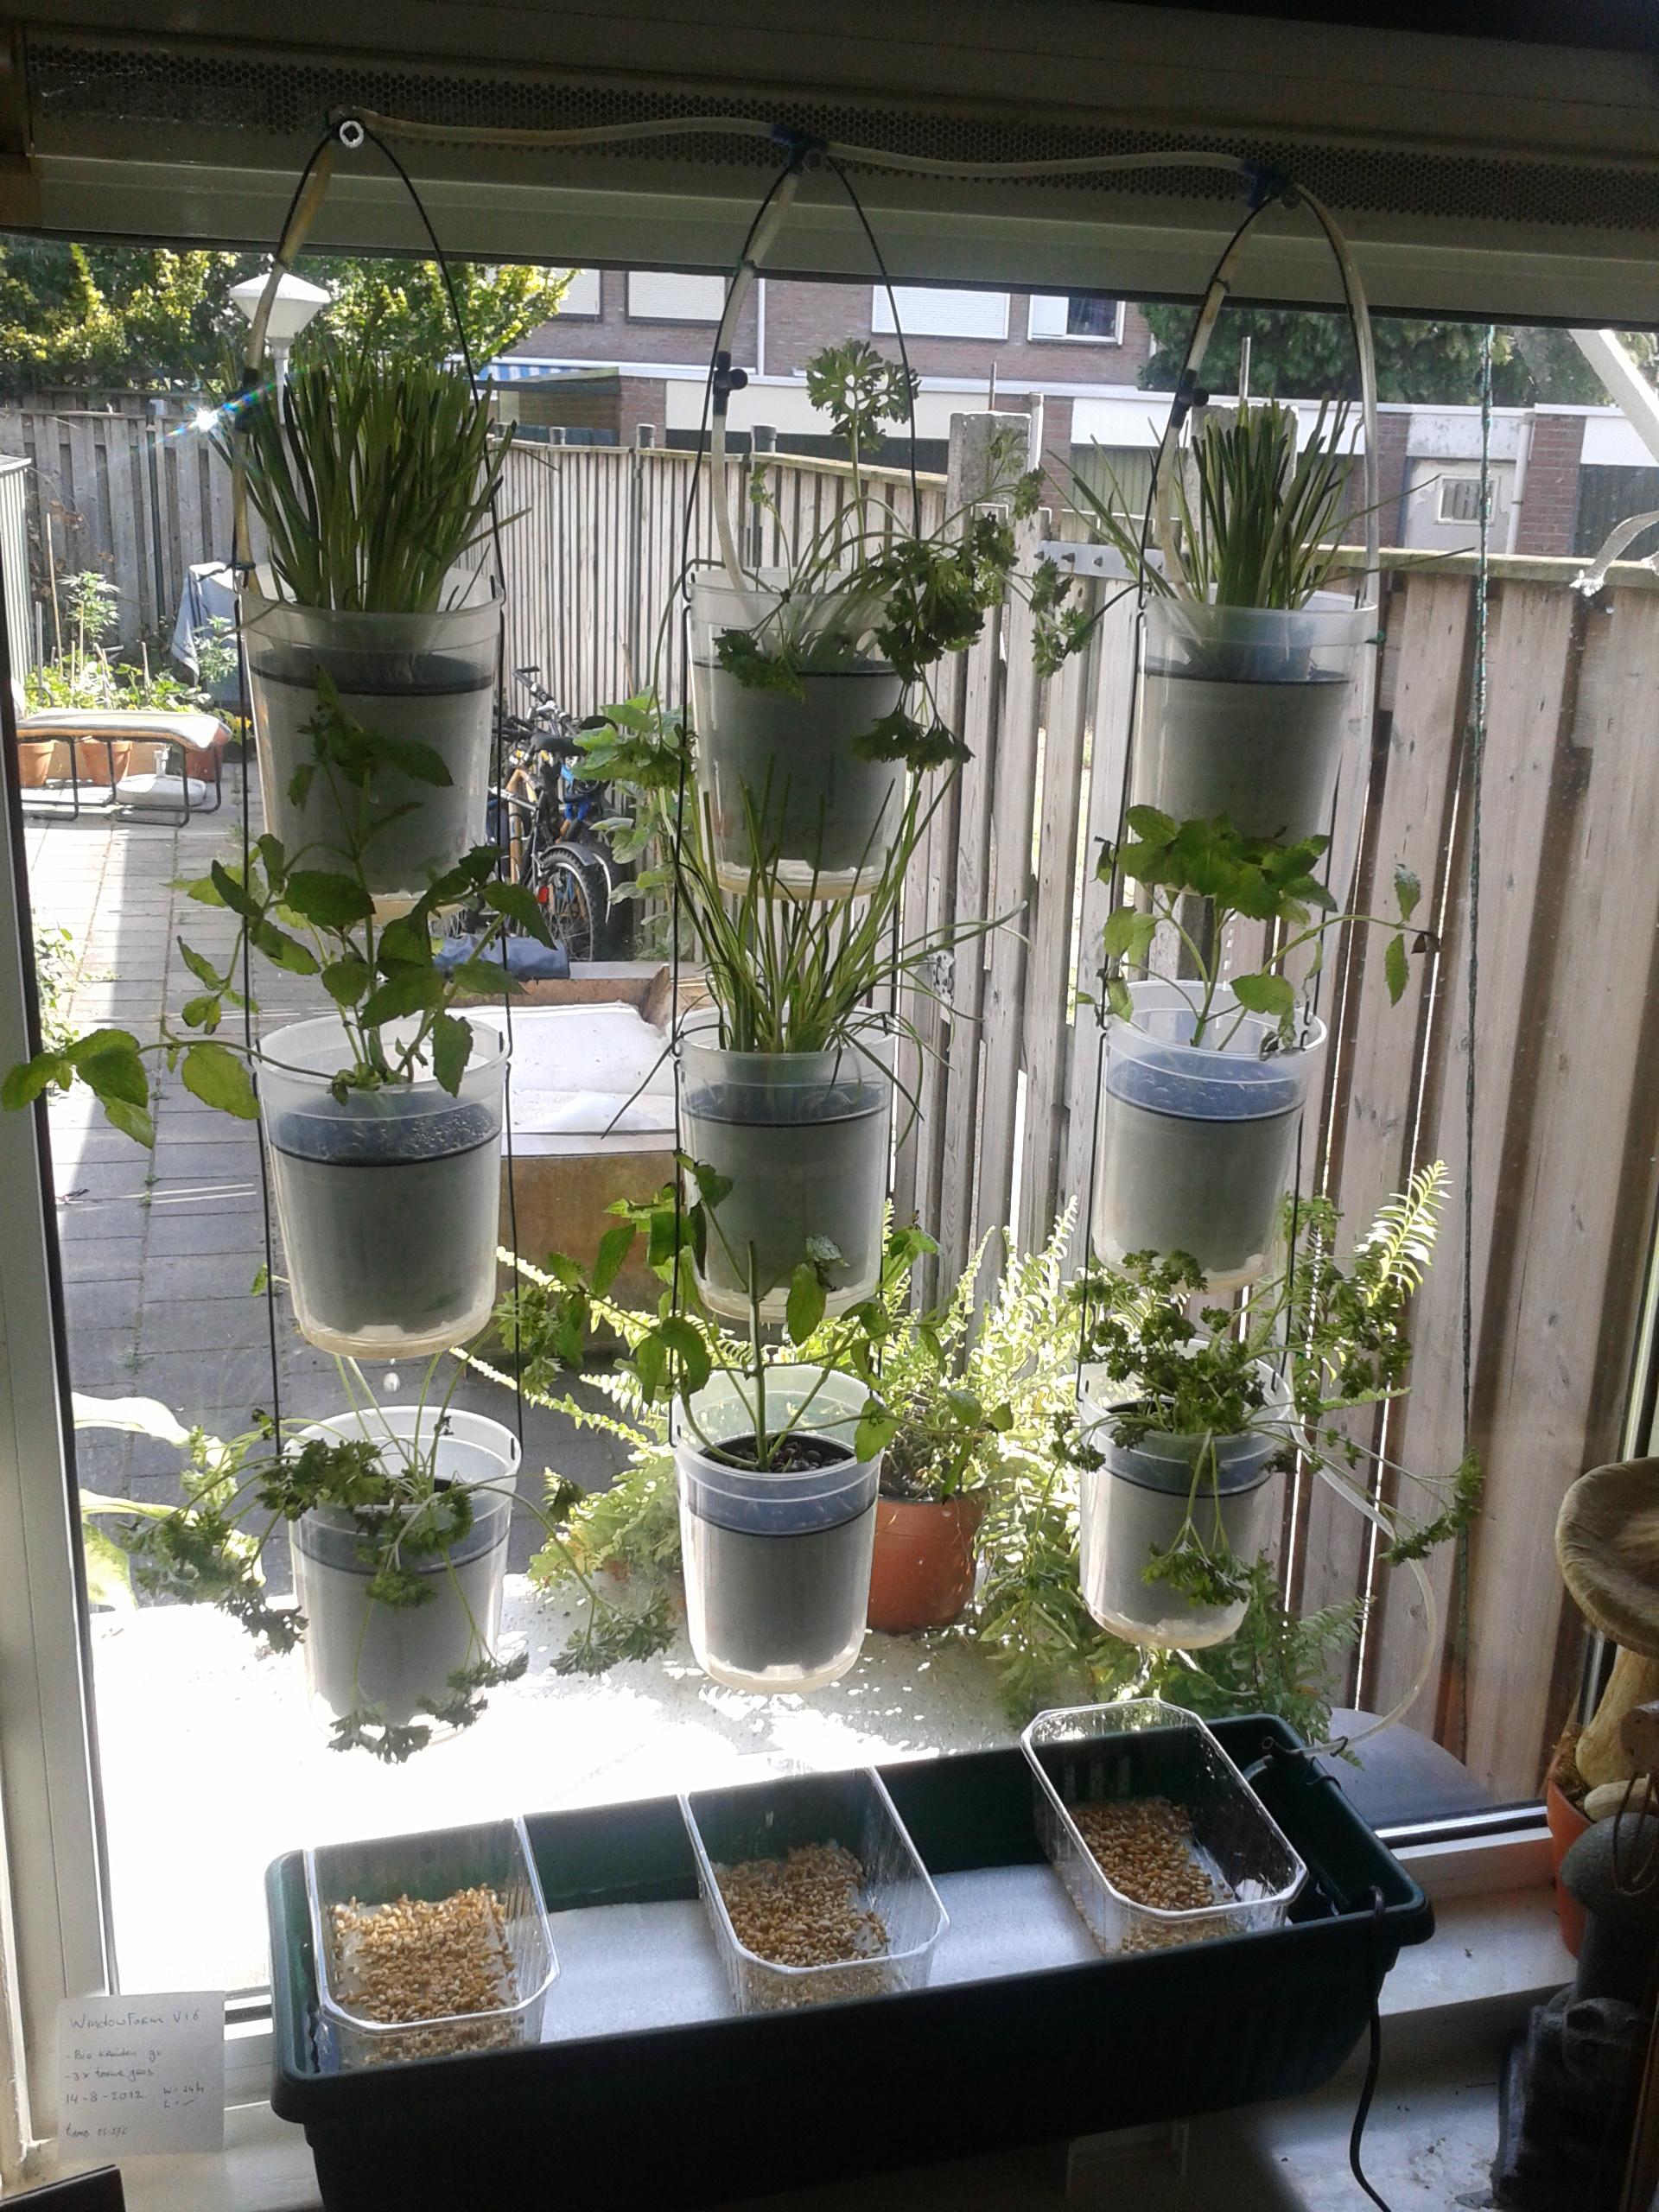 Windowfarm Modulair System (15)